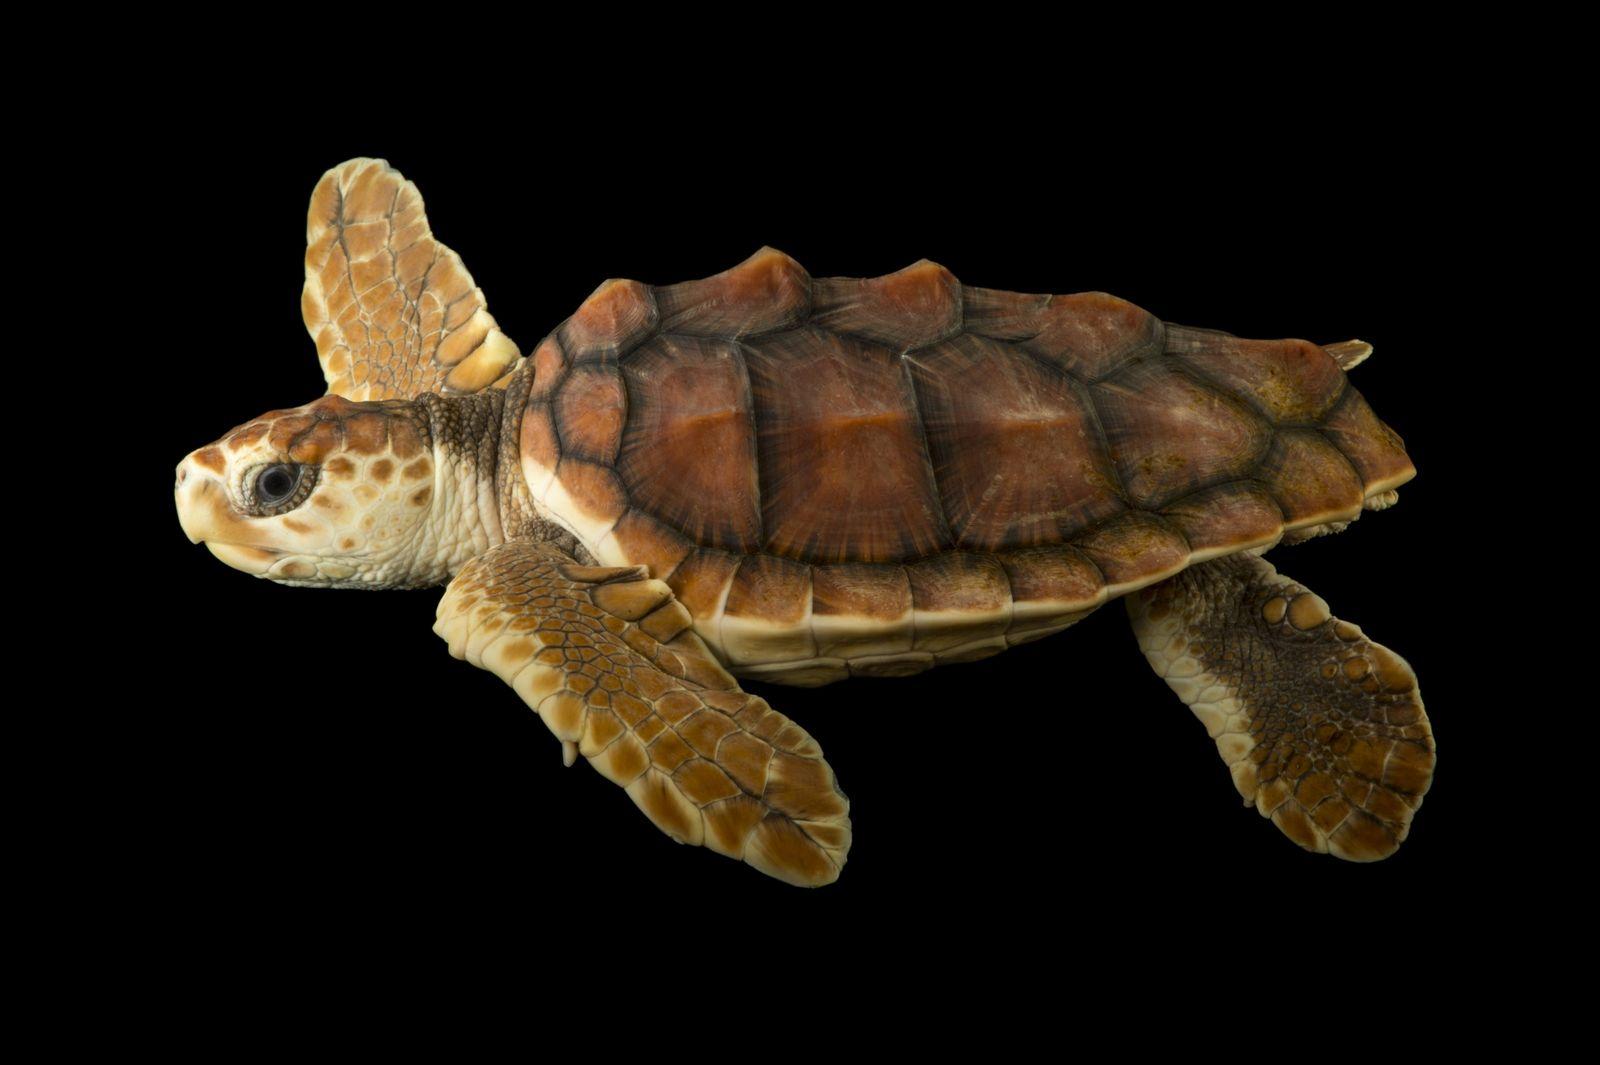 Tartaruga-cabeçuda